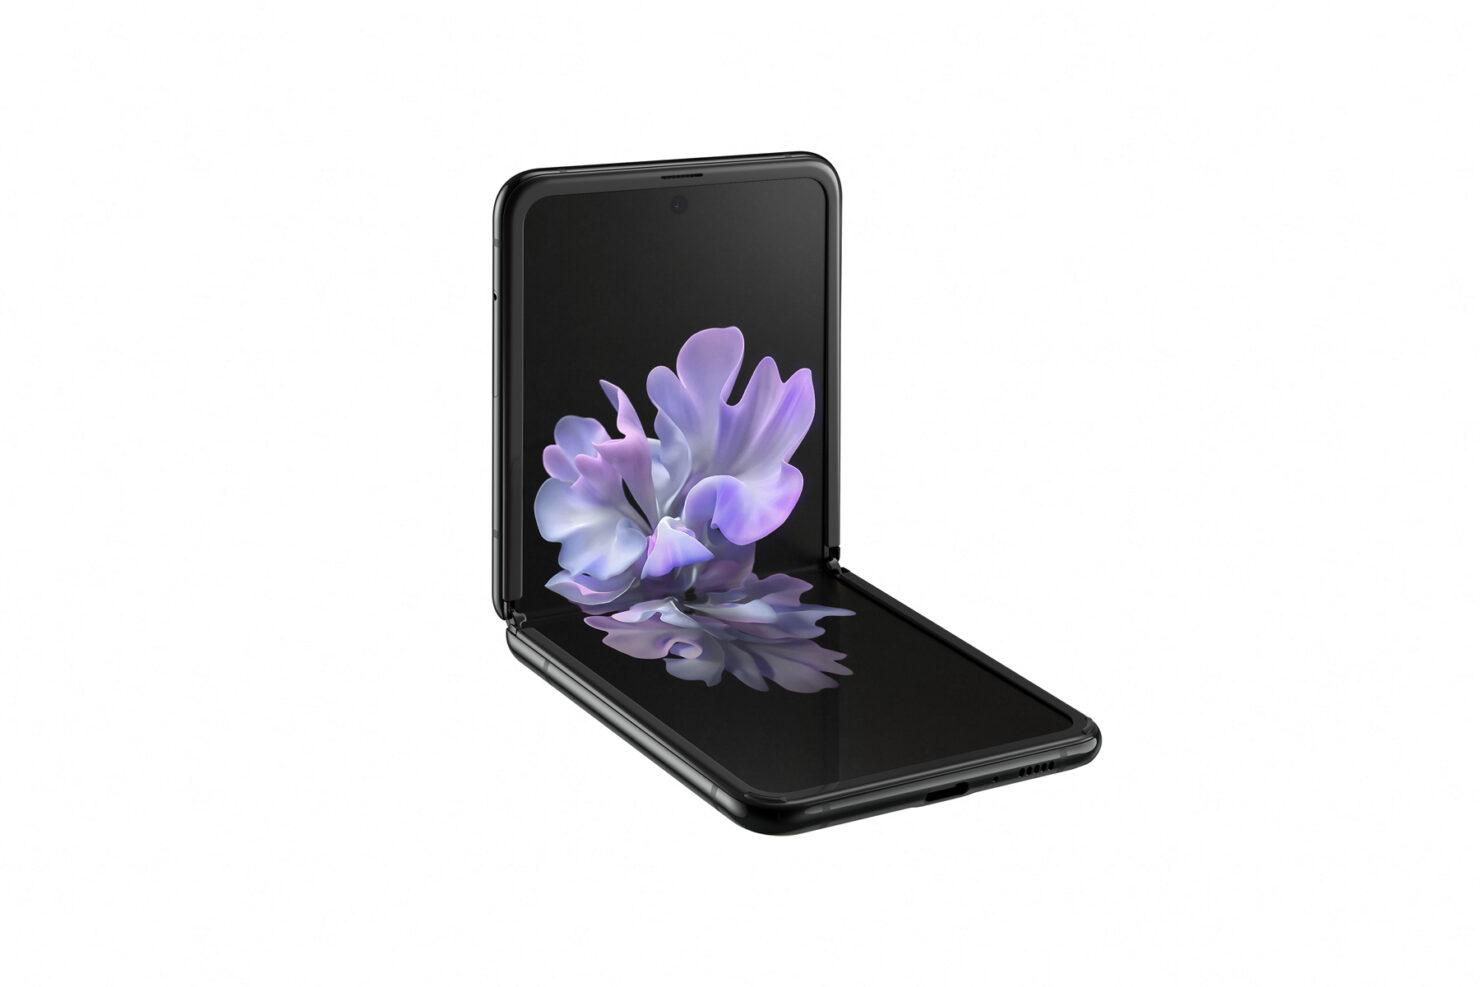 014_galaxyzflip_mirror_black_l30_table_top